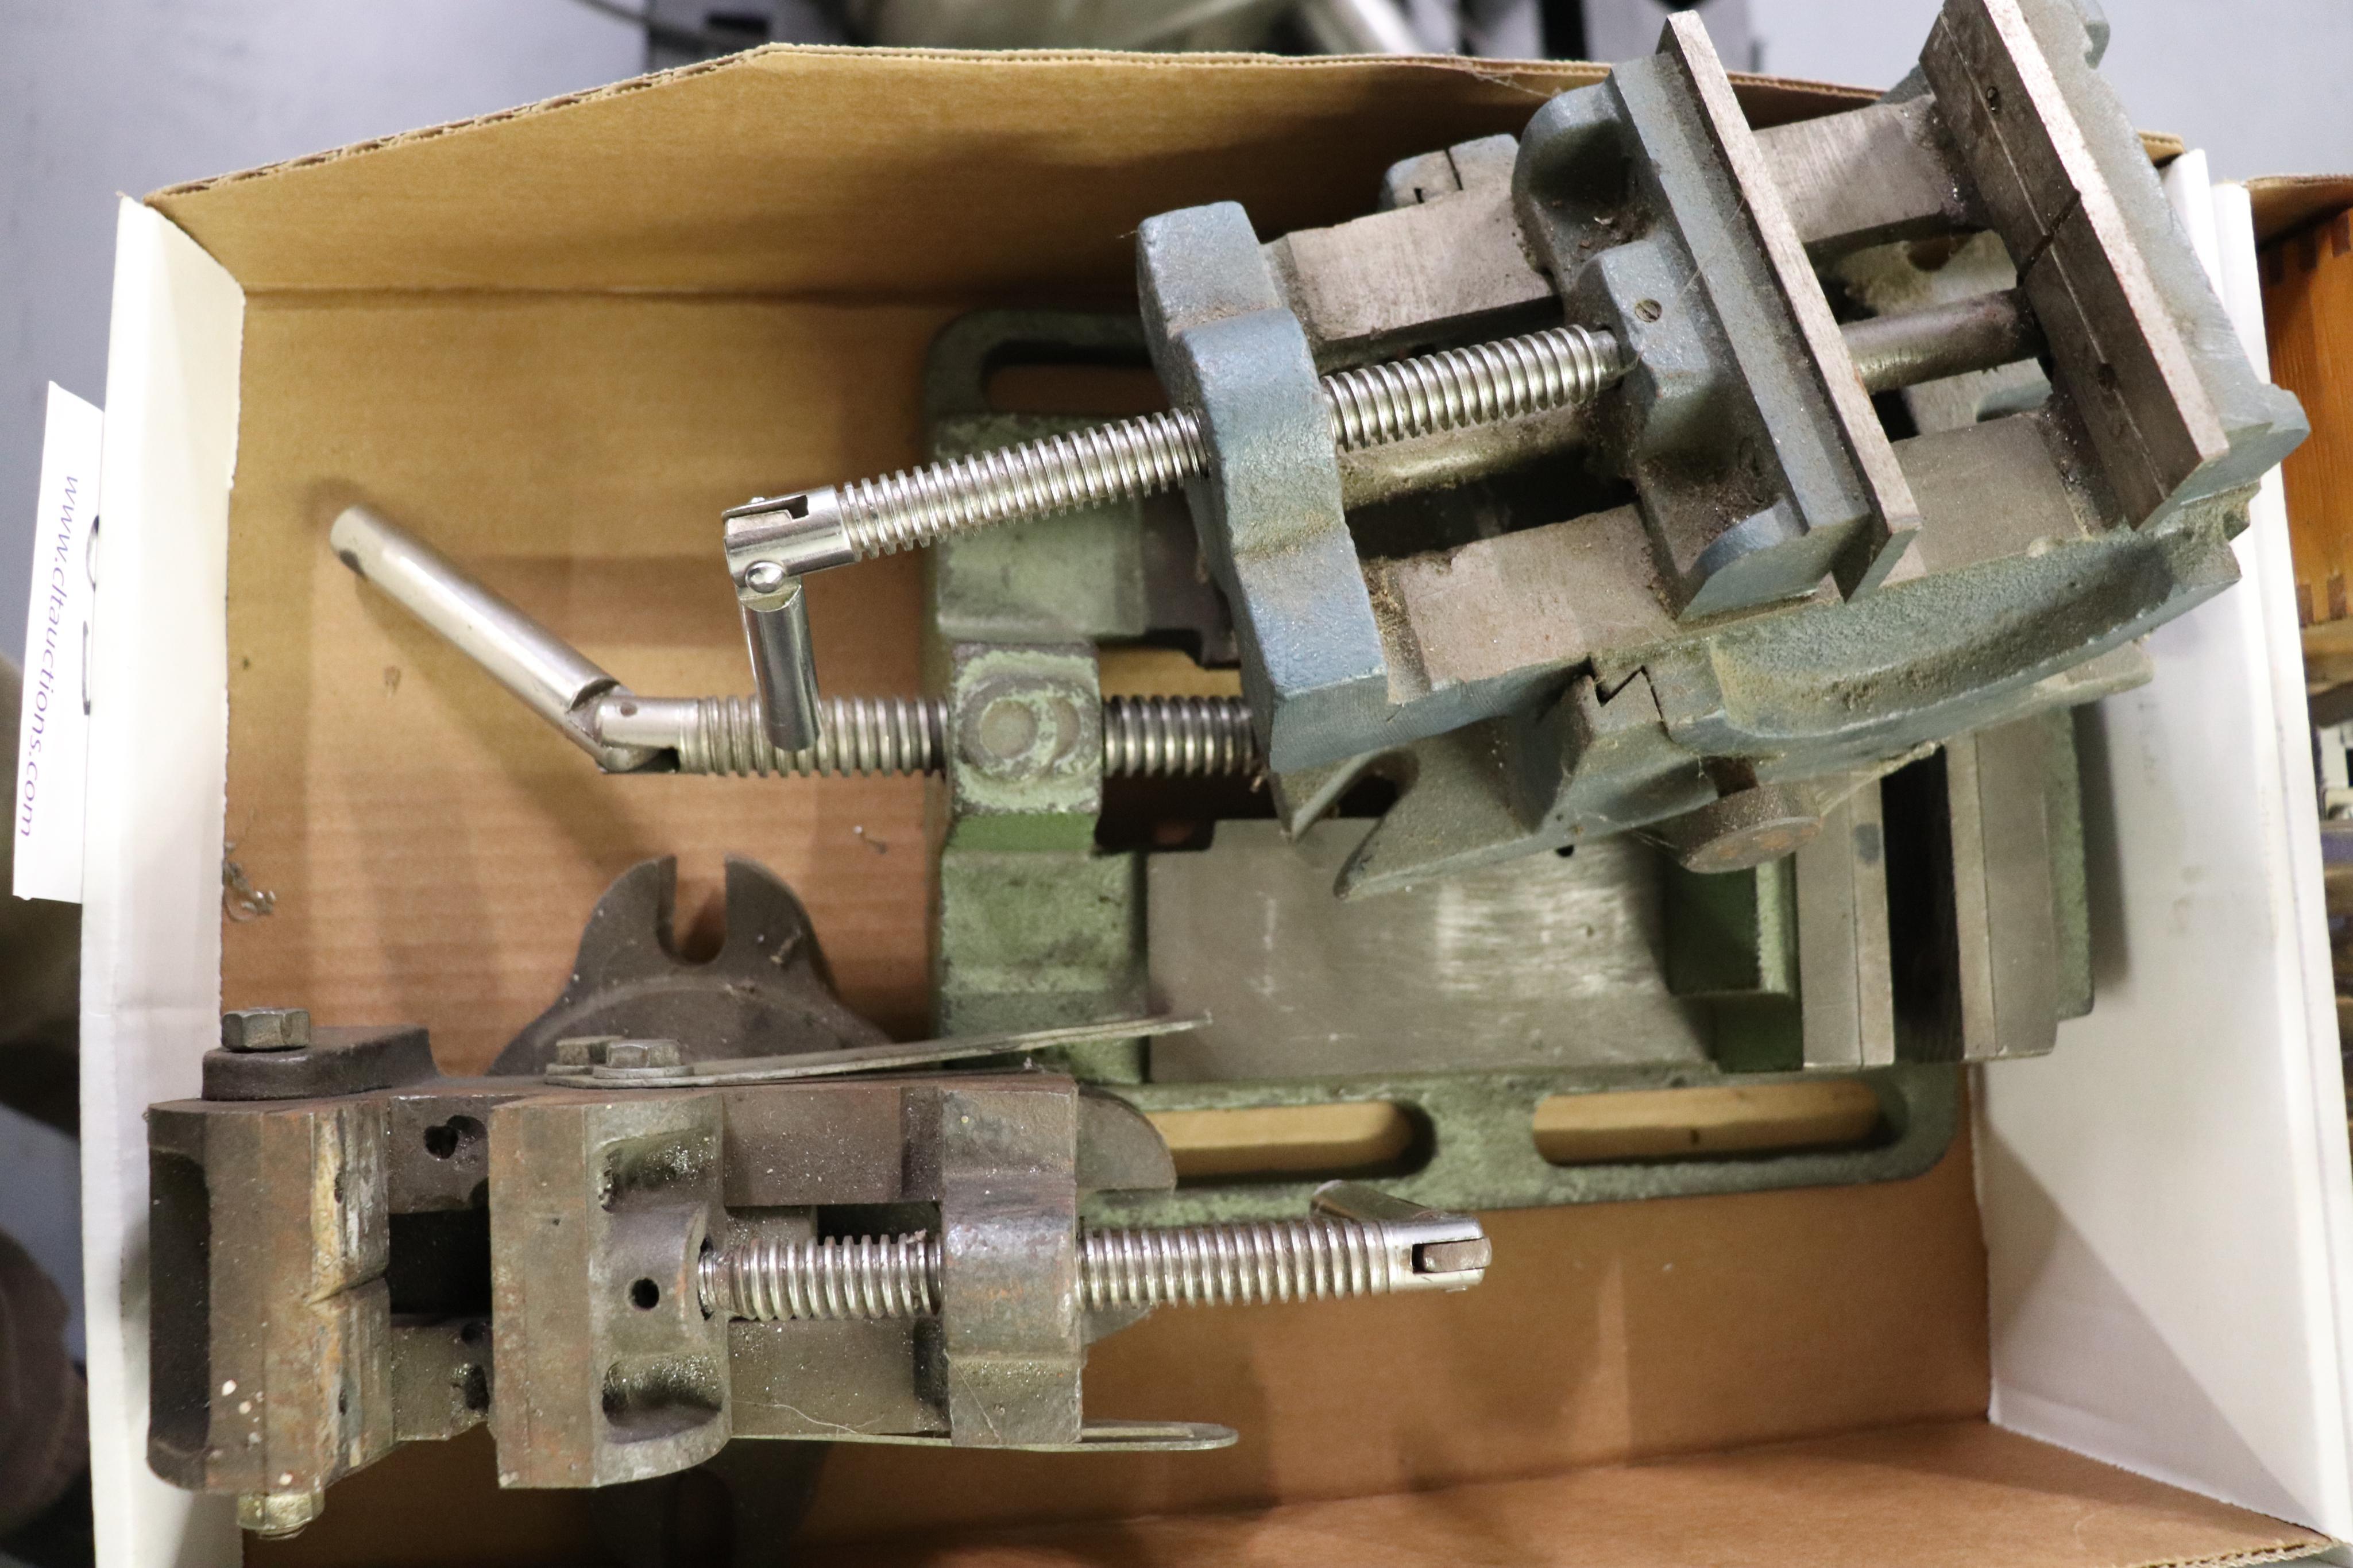 Drill press vises - Image 2 of 3